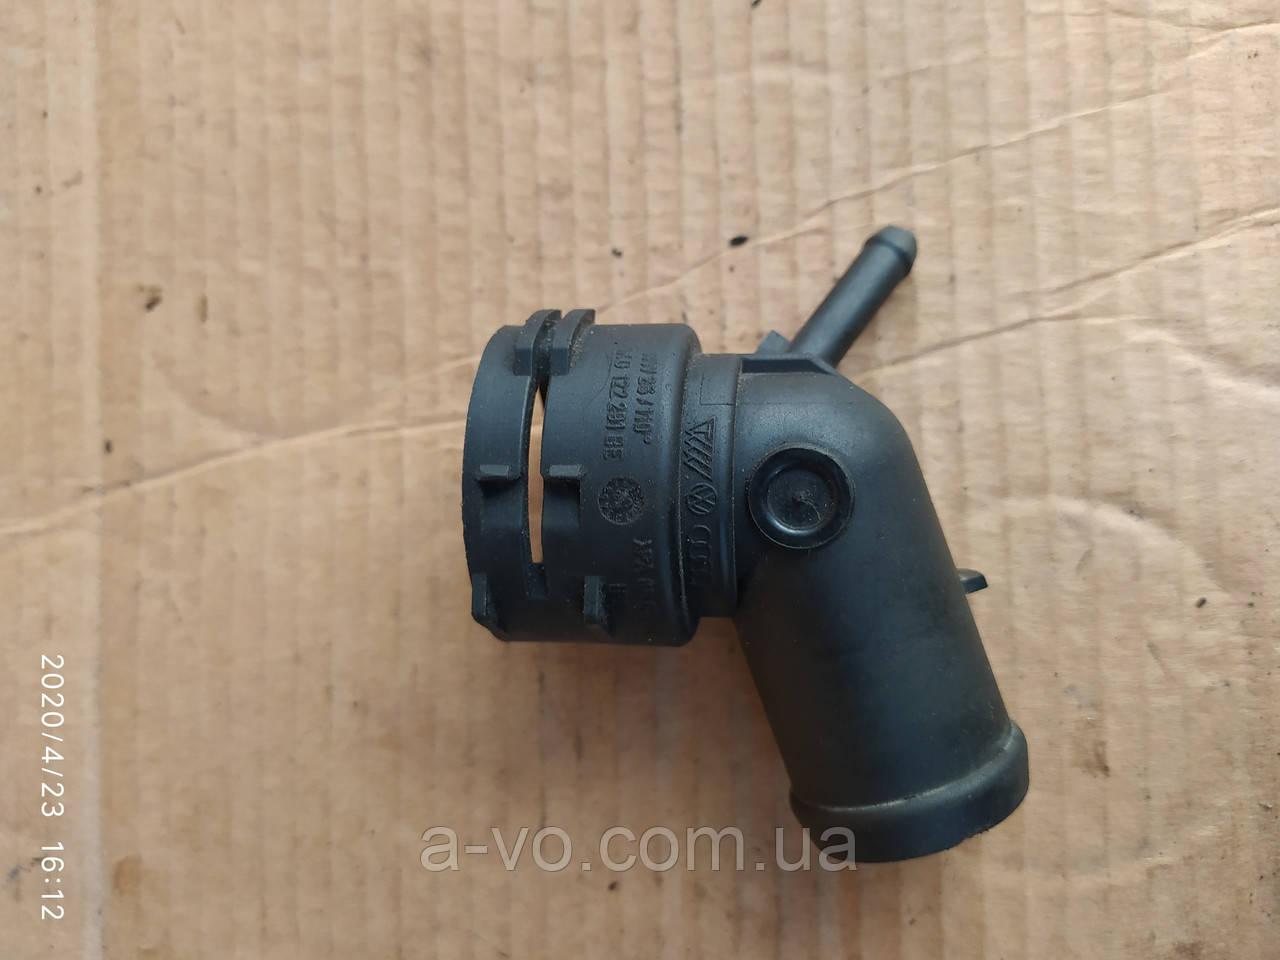 Патрубок системи охолодженя Skoda Oktavia VW 1k0122291